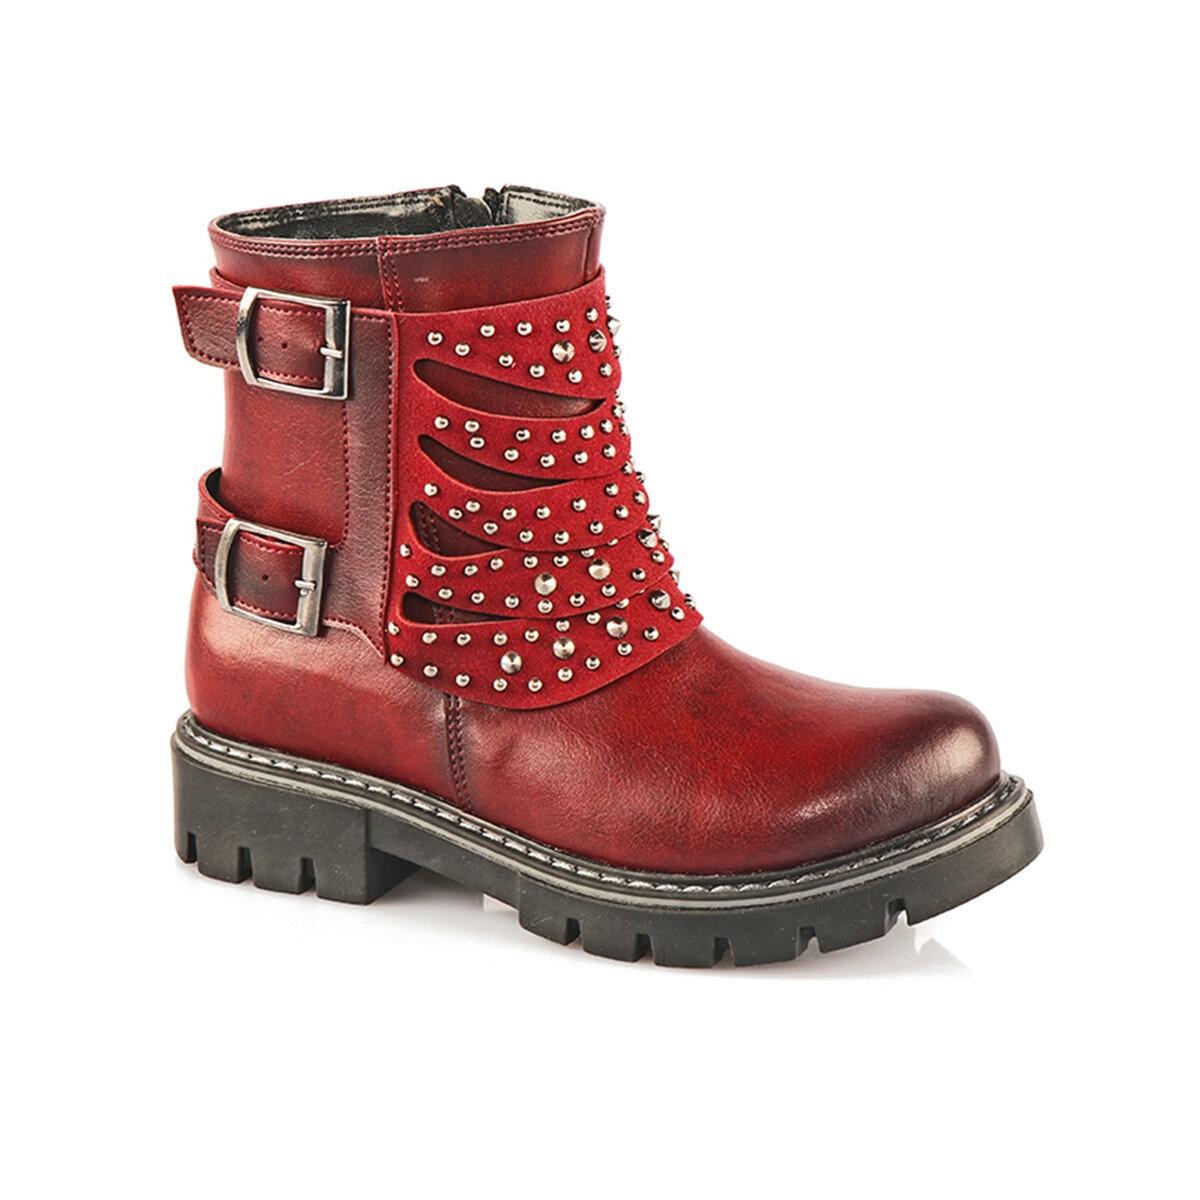 FLO 955. V.269 SD Maroon Female Child Boots VICCO